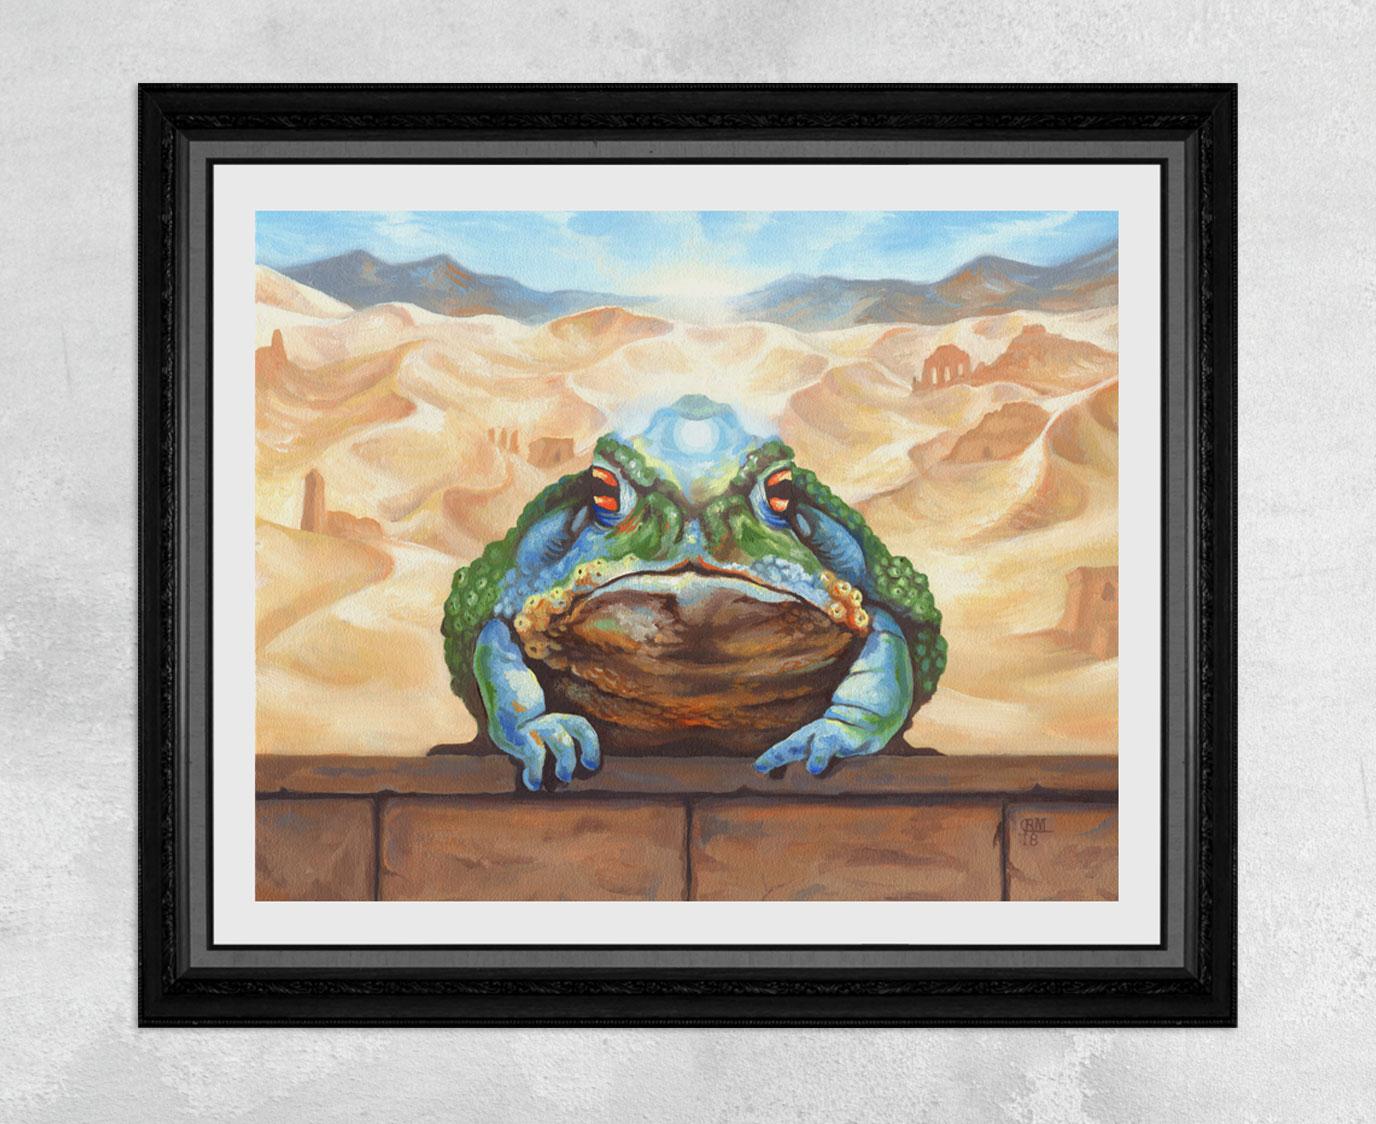 Magical Desert Toad Print by Rebecca Magar - Wailing Wizard